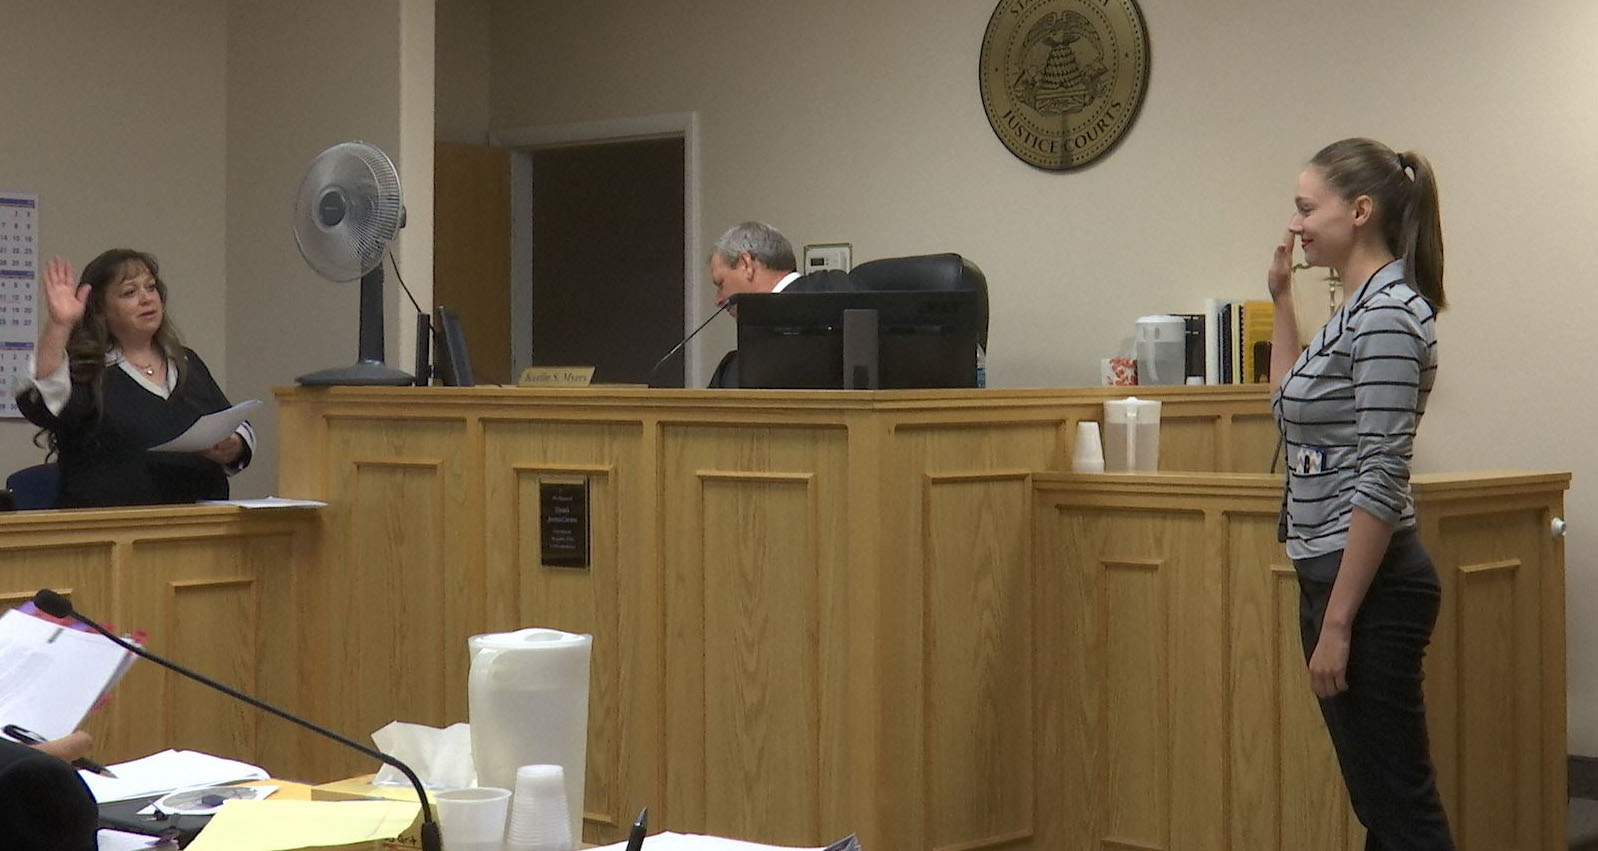 Elizabeth Peterson testifies at Varlo Davenport's jury trial Wednesday, St. George, Utah, July 13, 2016   Photo by Sheldon Demke, St. George News